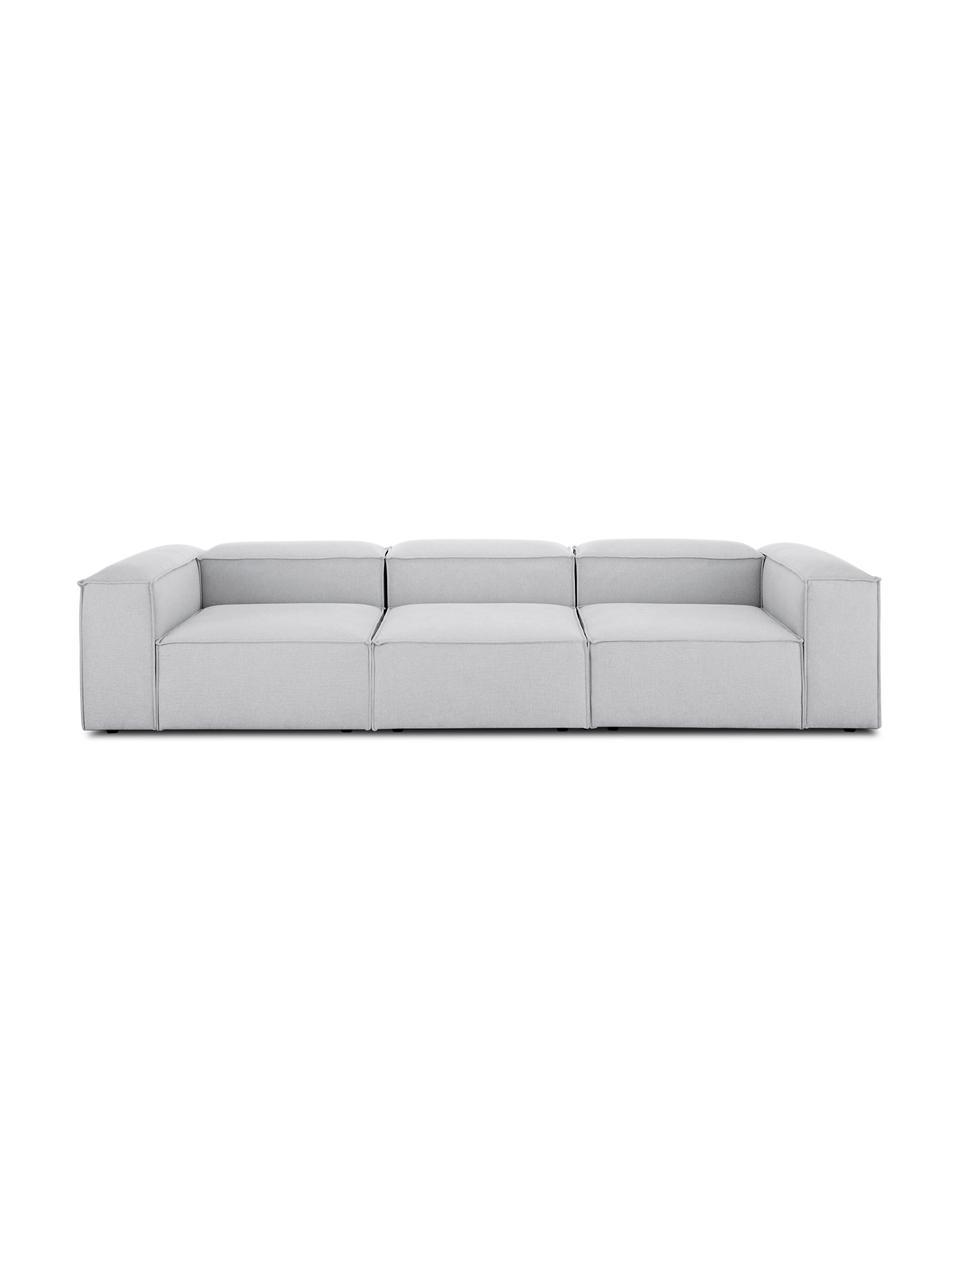 Modulares Sofa Lennon (4-Sitzer) in Hellgrau, Bezug: Polyester Der hochwertige, Gestell: Massives Kiefernholz, Spe, Füße: Kunststoff, Webstoff Hellgrau, B 326 x T 119 cm